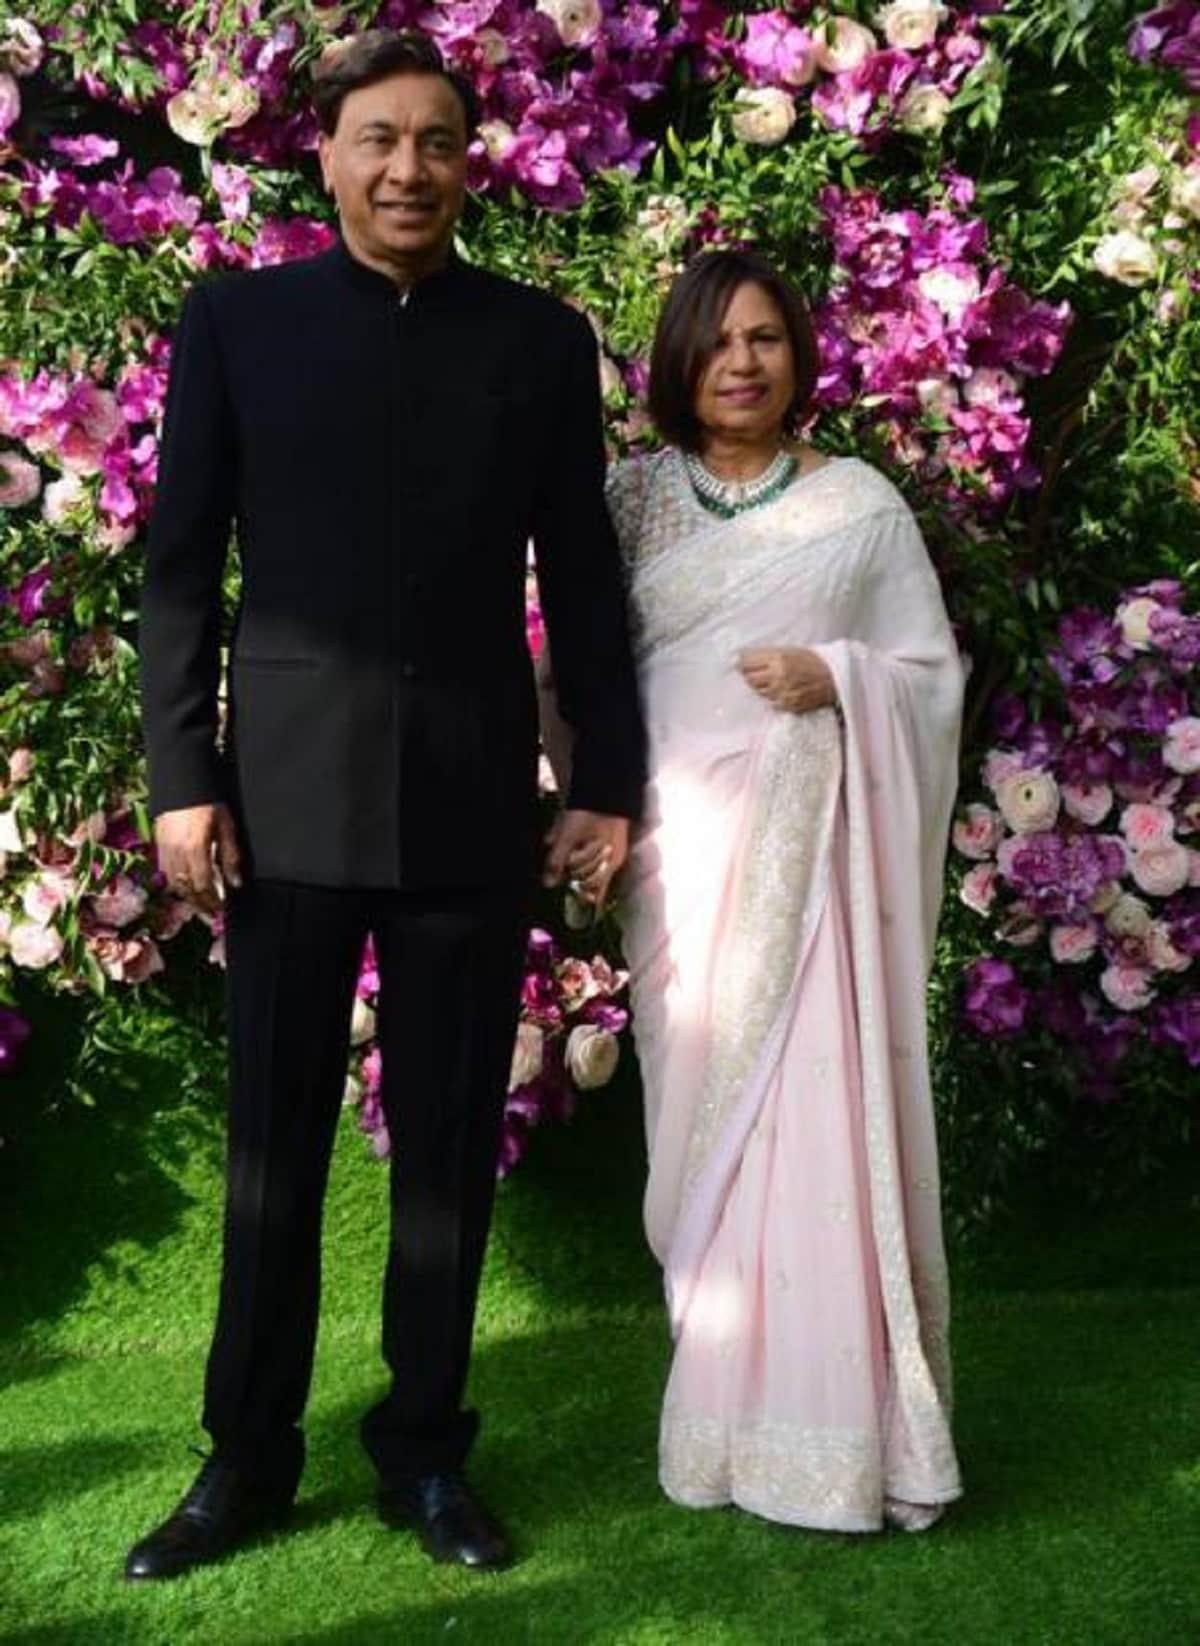 Indian steel magnate Lakshmi Mittal and his wife Usha Mittal grace Akash Ambani and Shloka Mehta's wedding. (Image: Viral Bhayani)